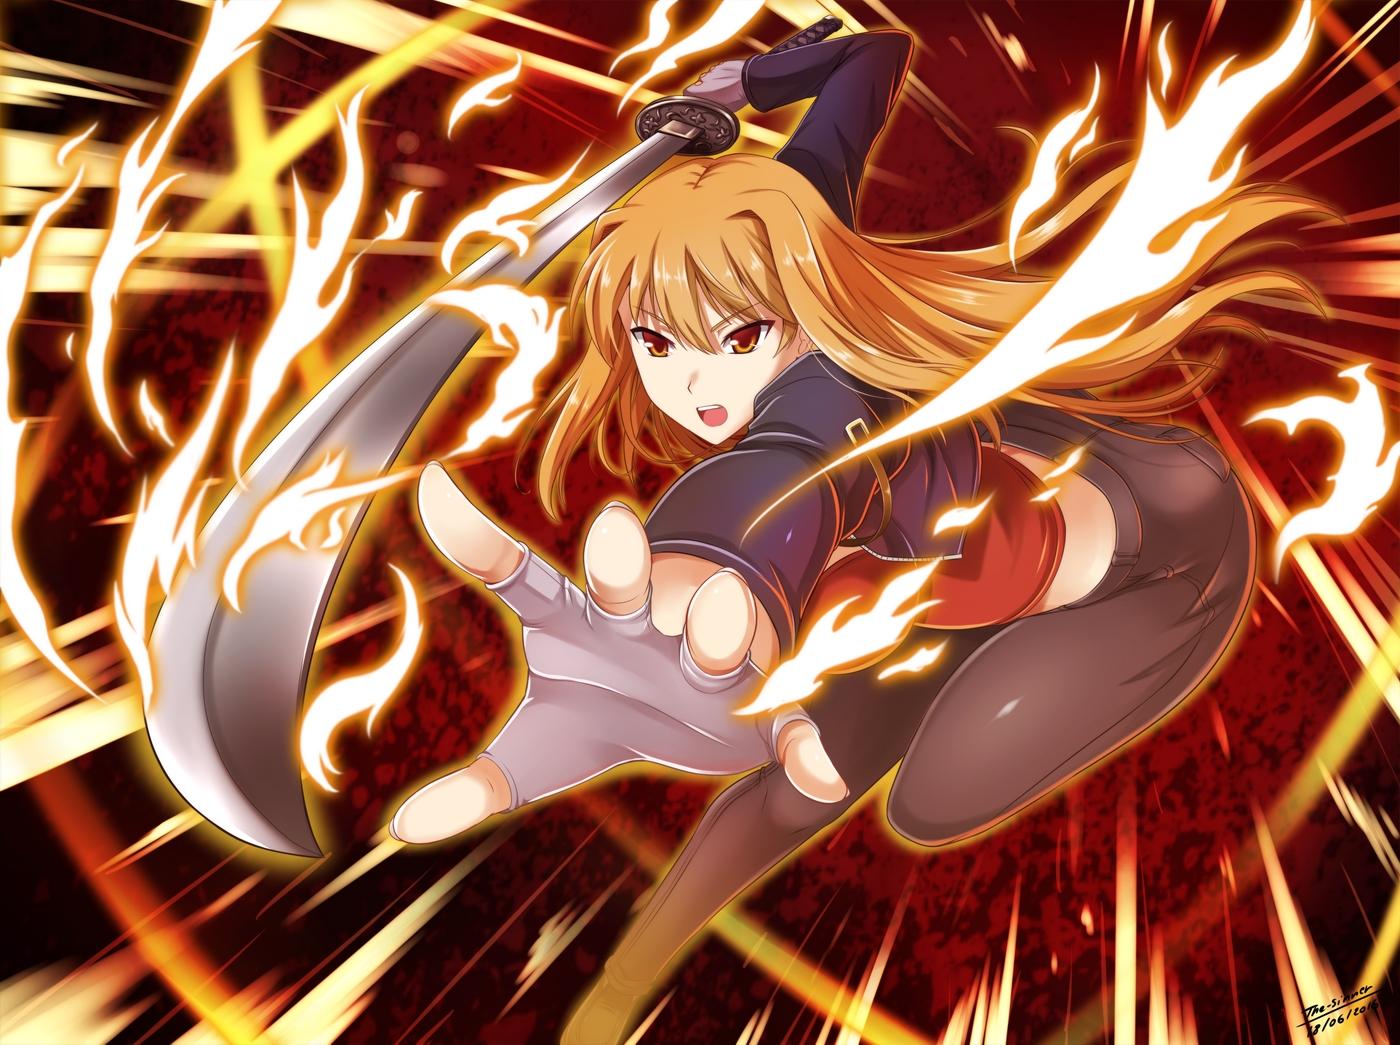 brown_eyes brown_hair katana long_hair sword tagme_(character) the-sinner weapon